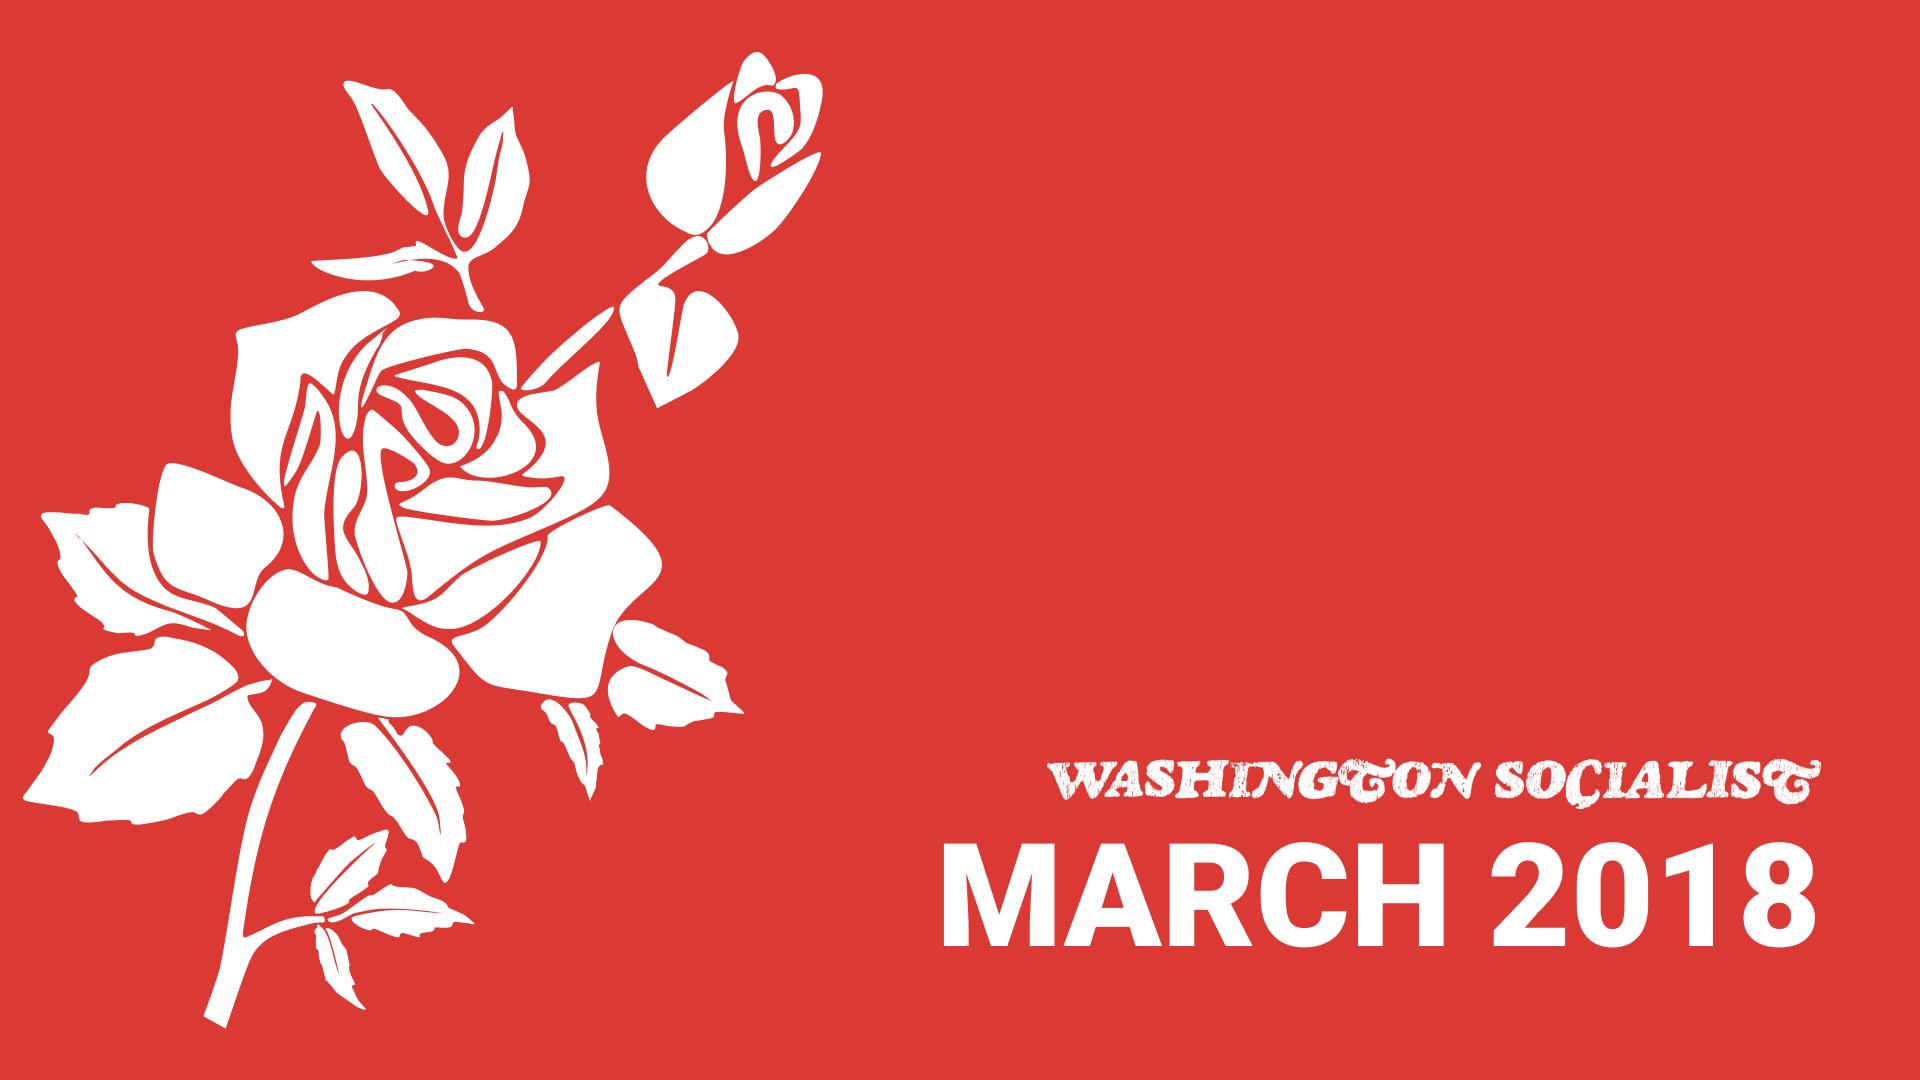 Washington Socialist Cover, March 2018